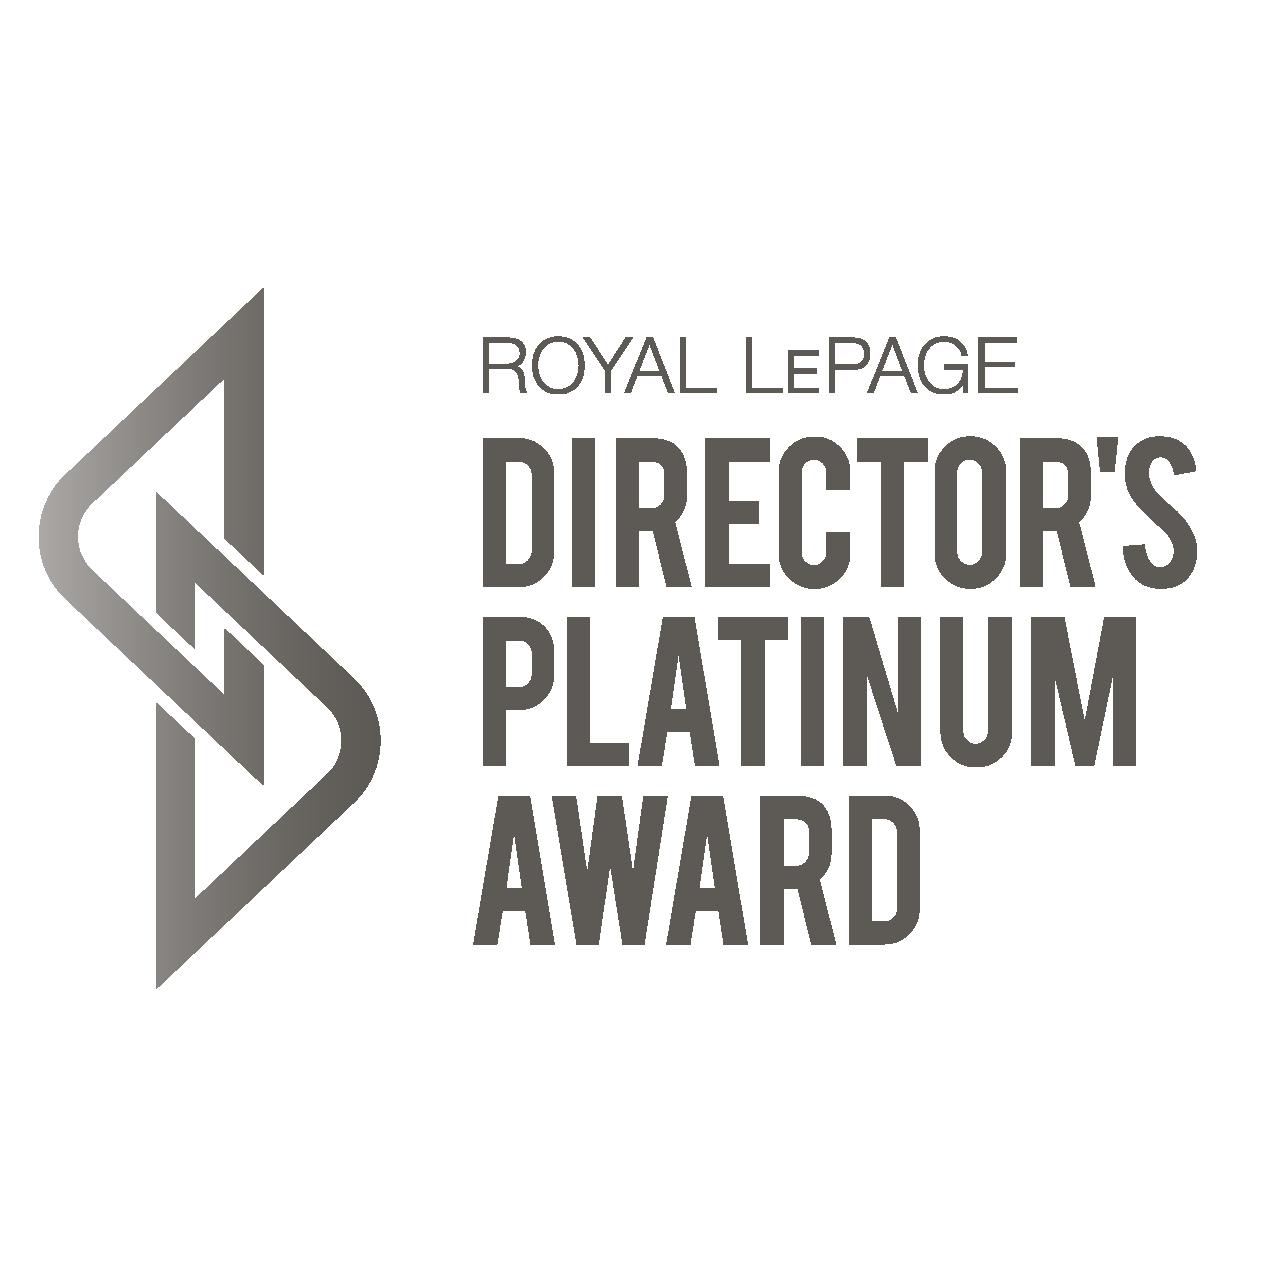 Director's Platinum award - square.png